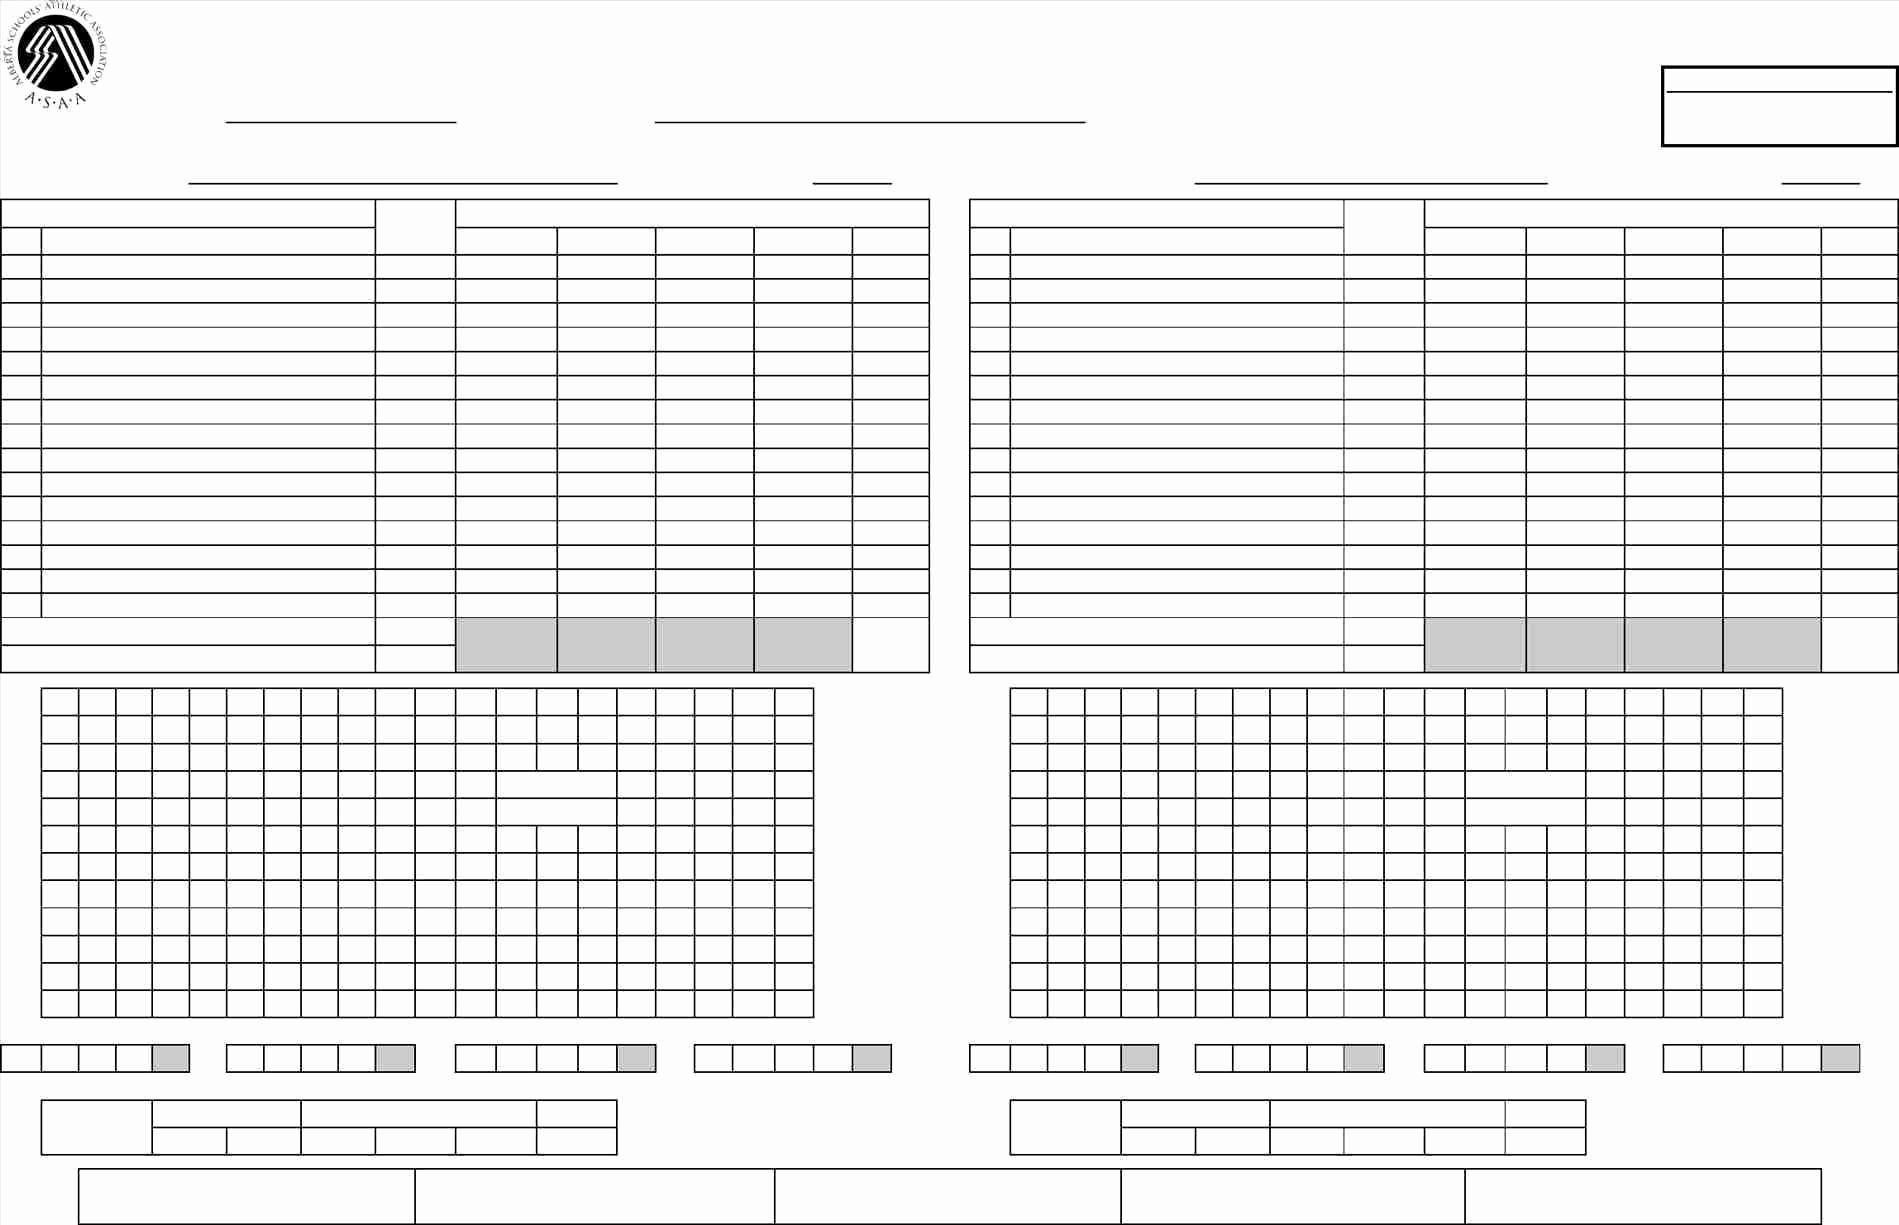 rmf controls spreadsheet